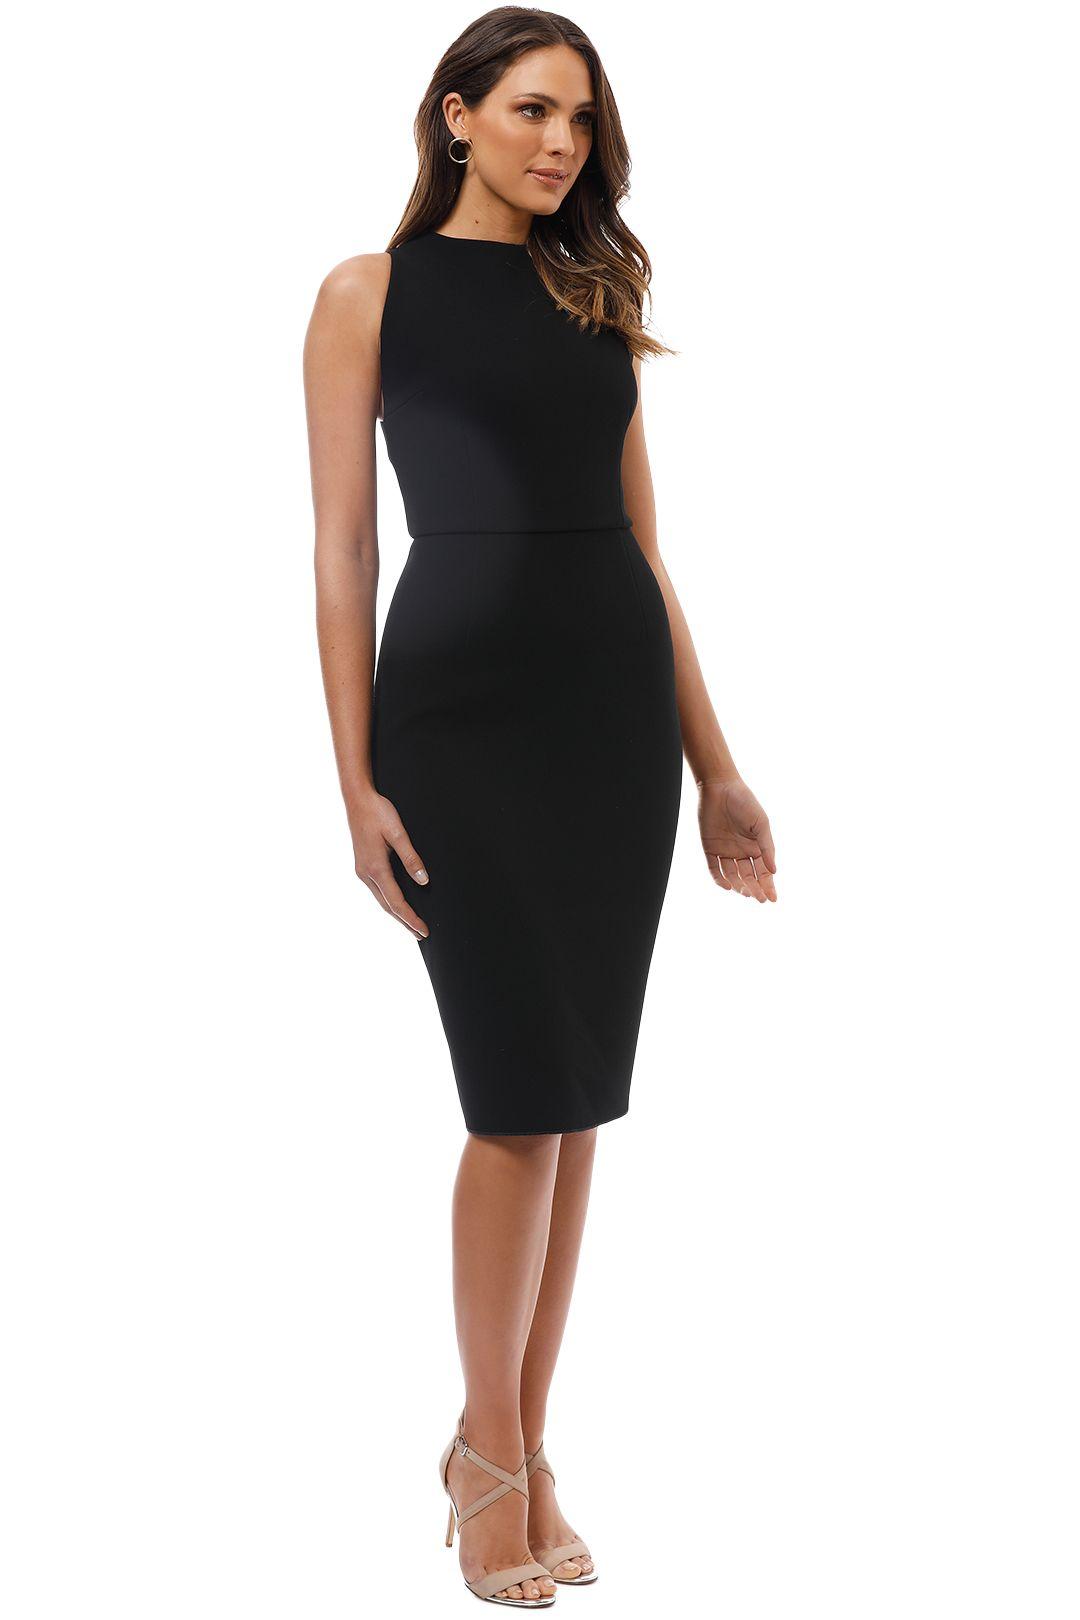 Yeojin Bae - Double Crepe Sophie Dress - Black - Side